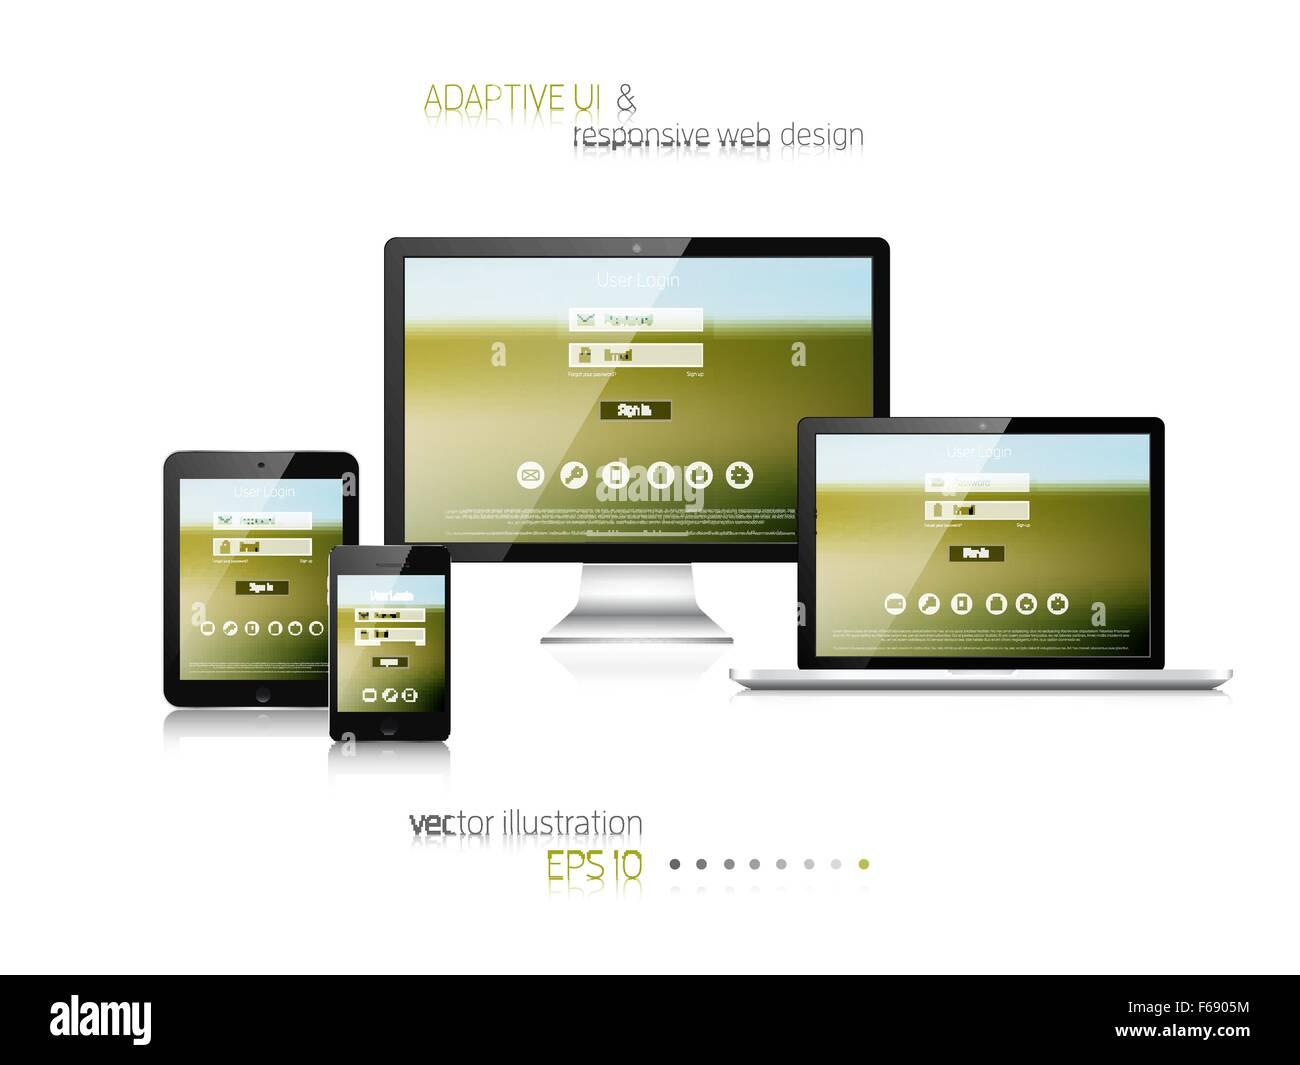 Diseño web sensible. Interfaz de usuario adaptable. Imagina ...